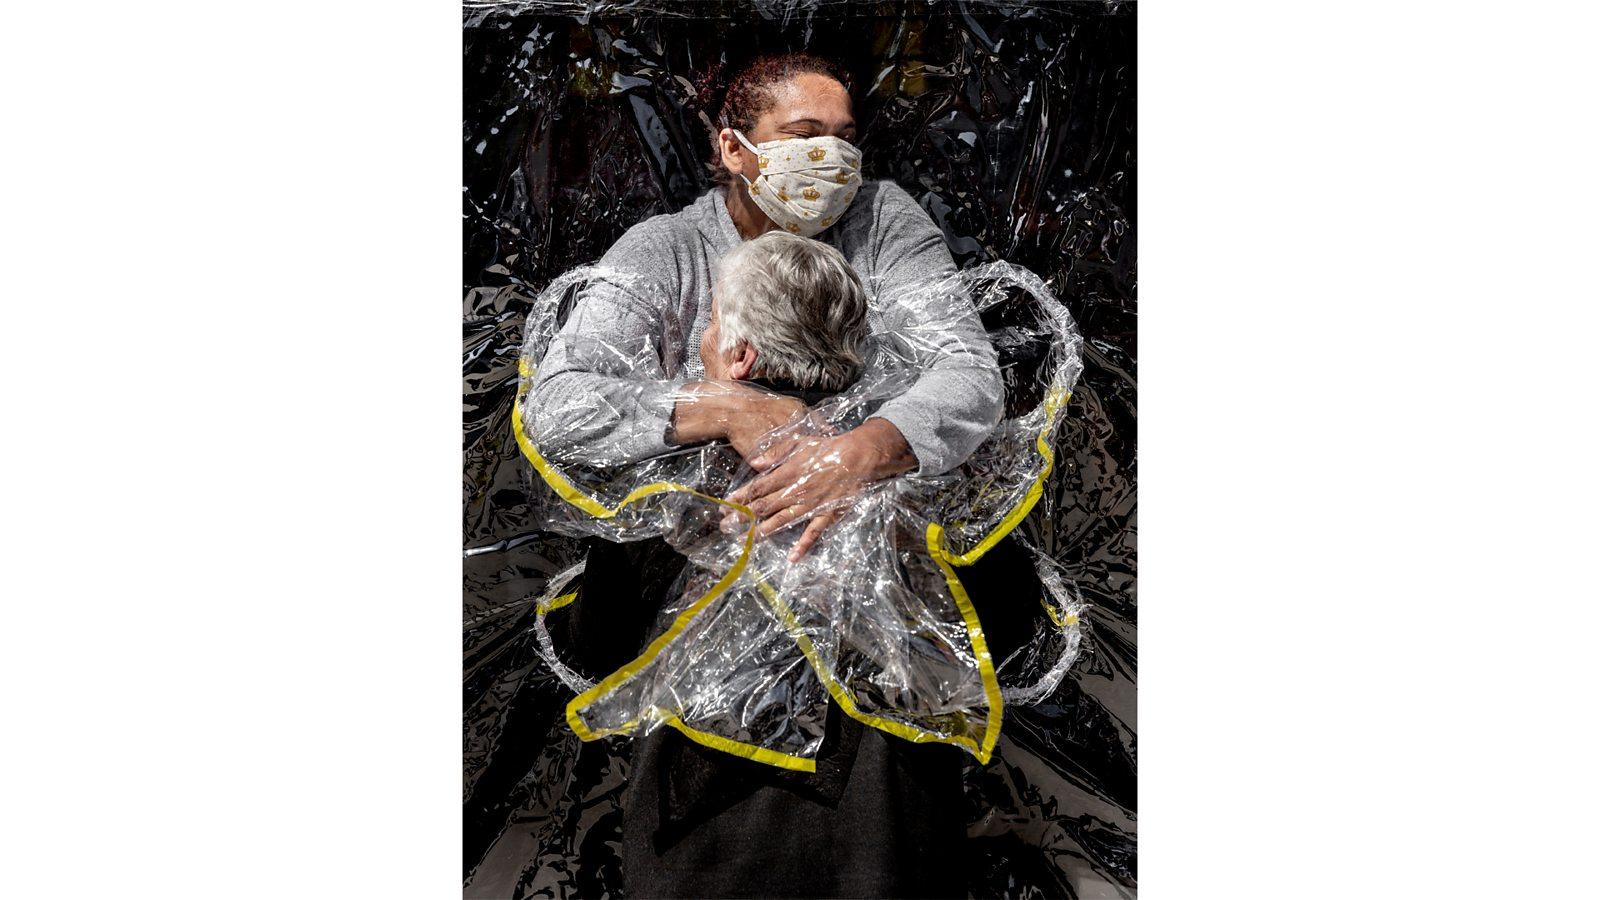 World Press Photo: 'Coronavirus hug' wins award